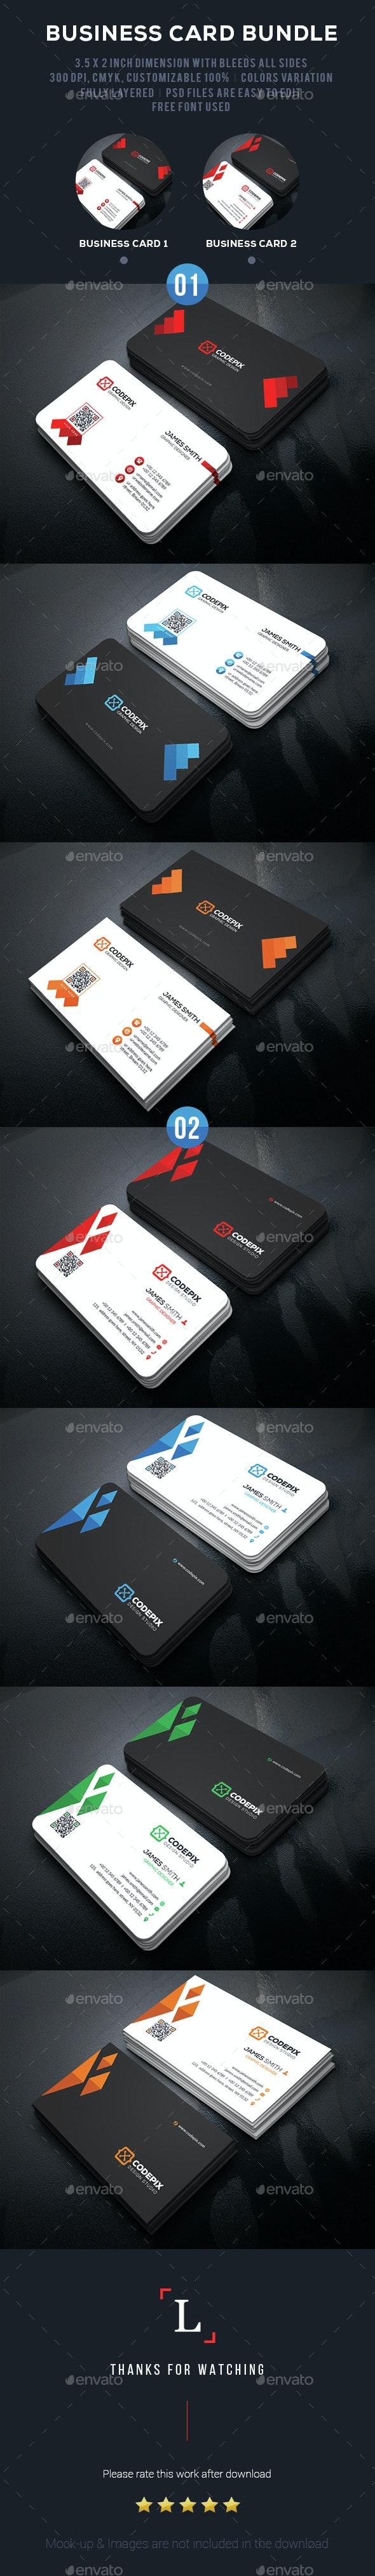 Graphic Business Card Bundle - Business Cards Print Templates